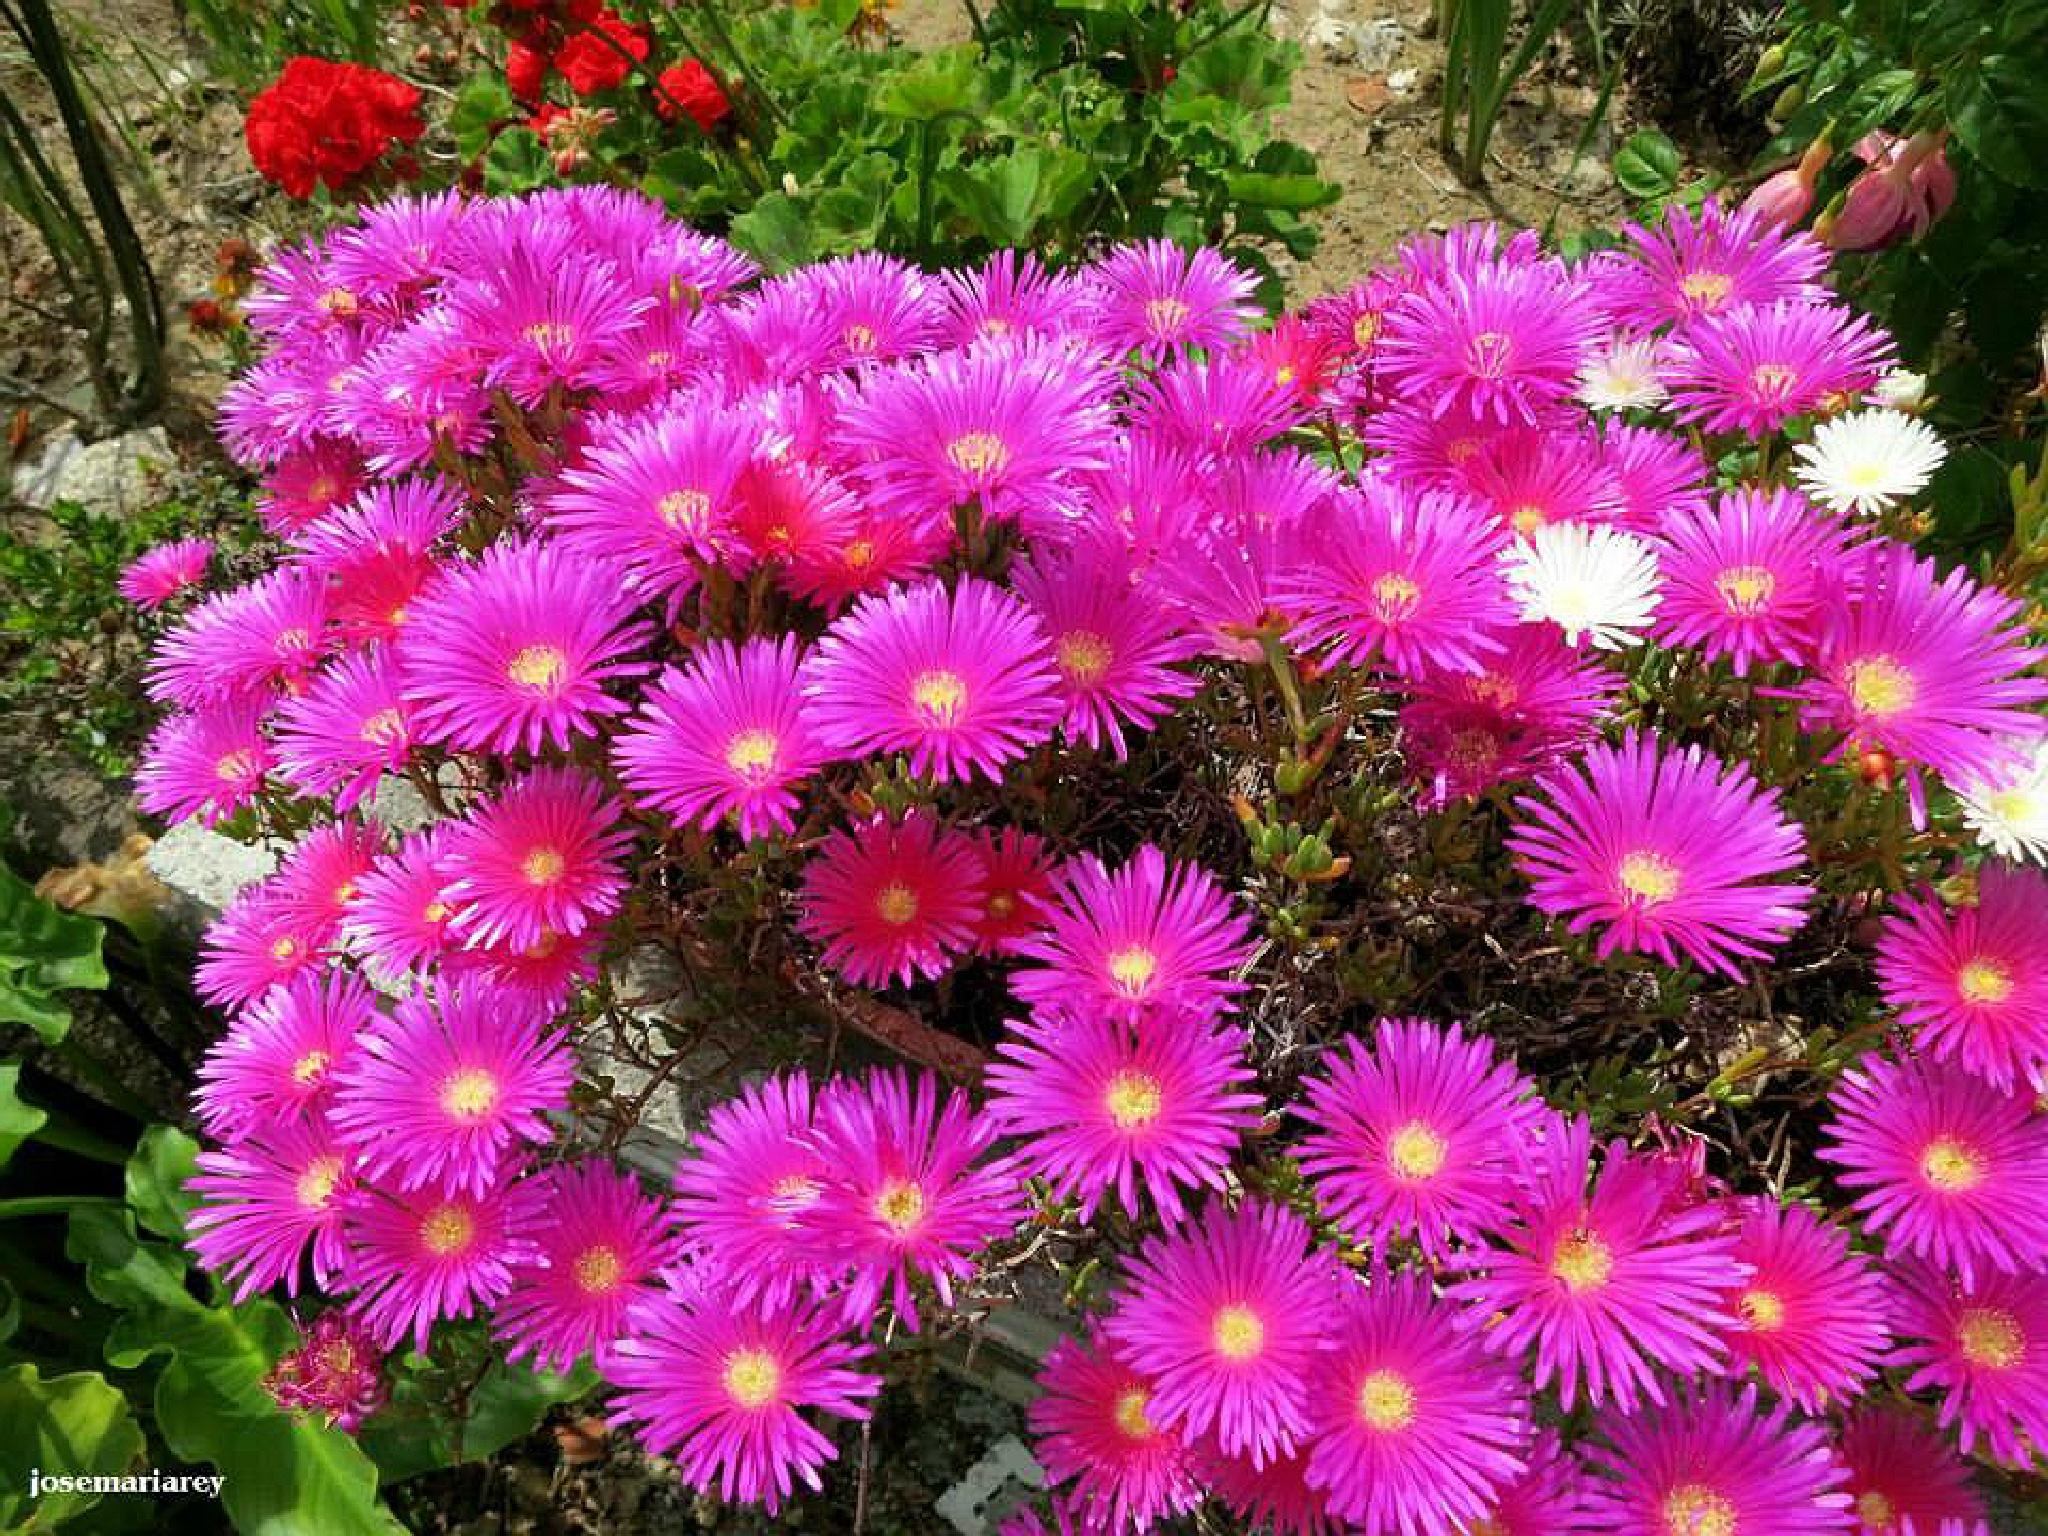 Flores silvestres. by josemariareymontes